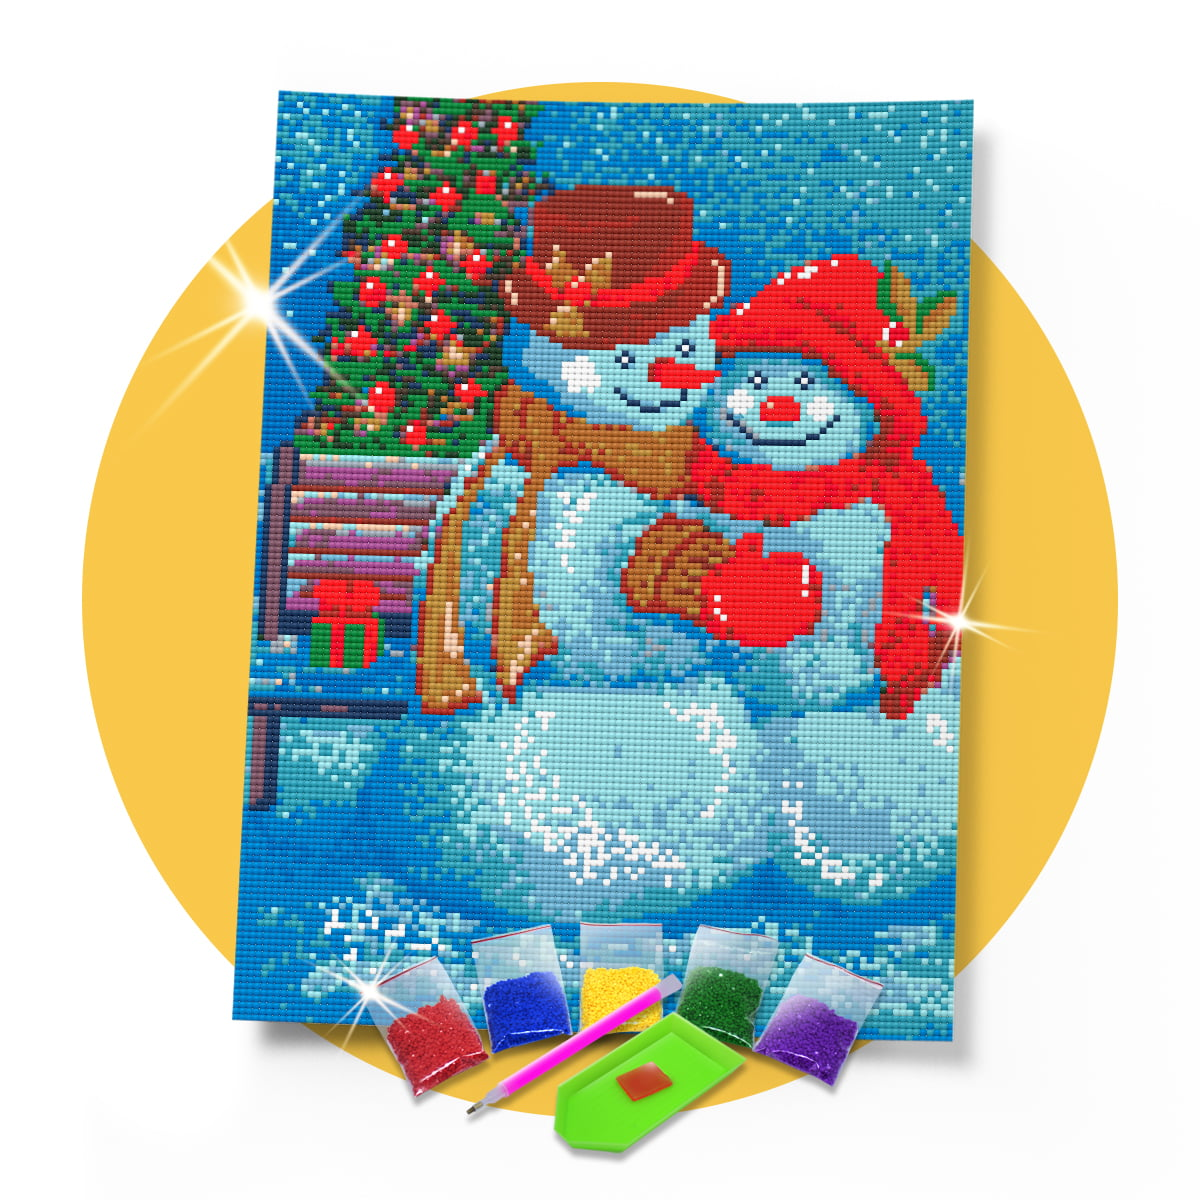 Tela Bonequinhos Felizes - 30 x 42 cm - Diamante Redondo